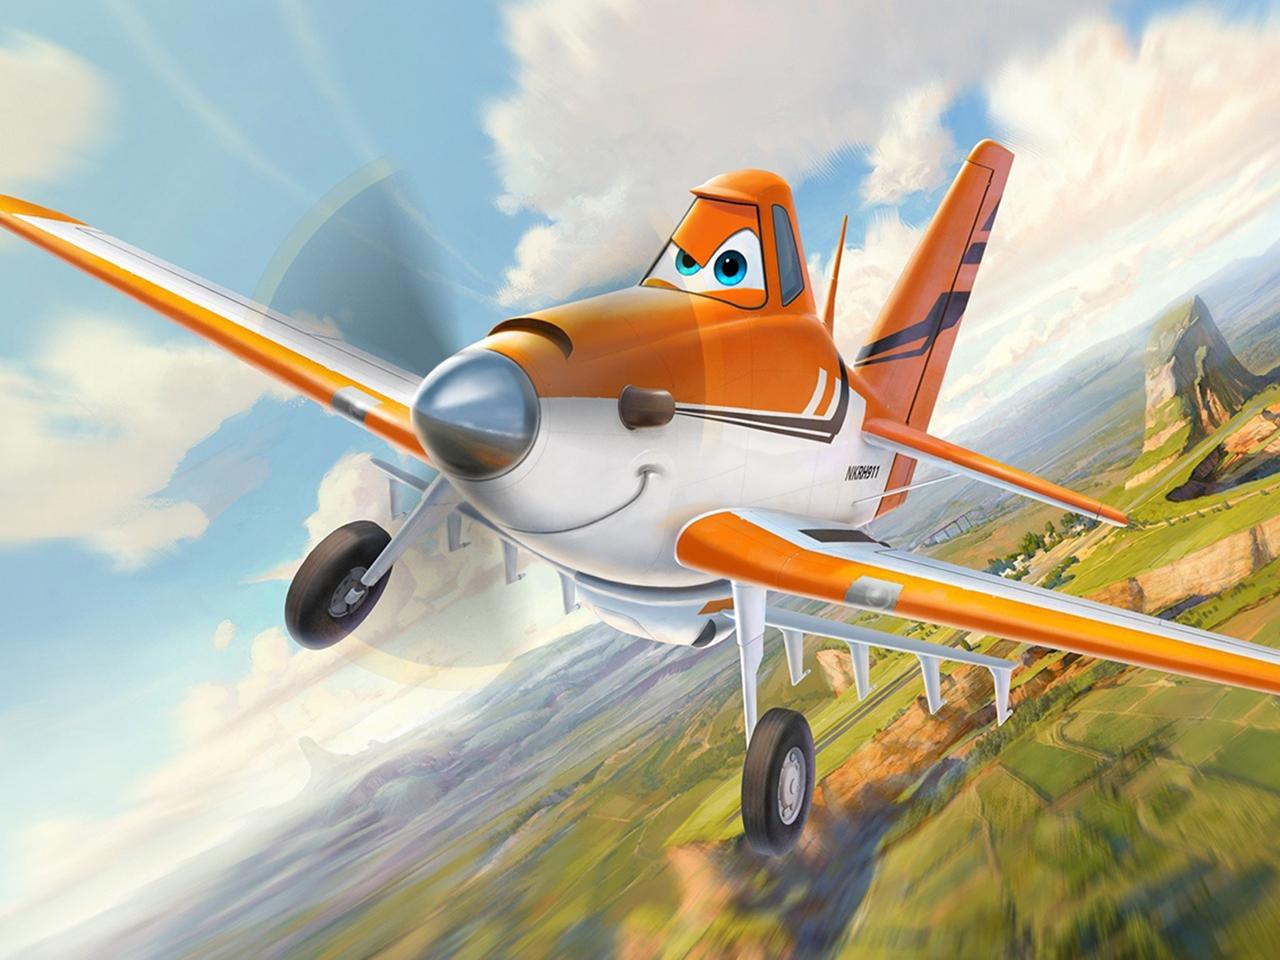 Dusty Crophopper from Walt Disney Pictures' Planes (2013)